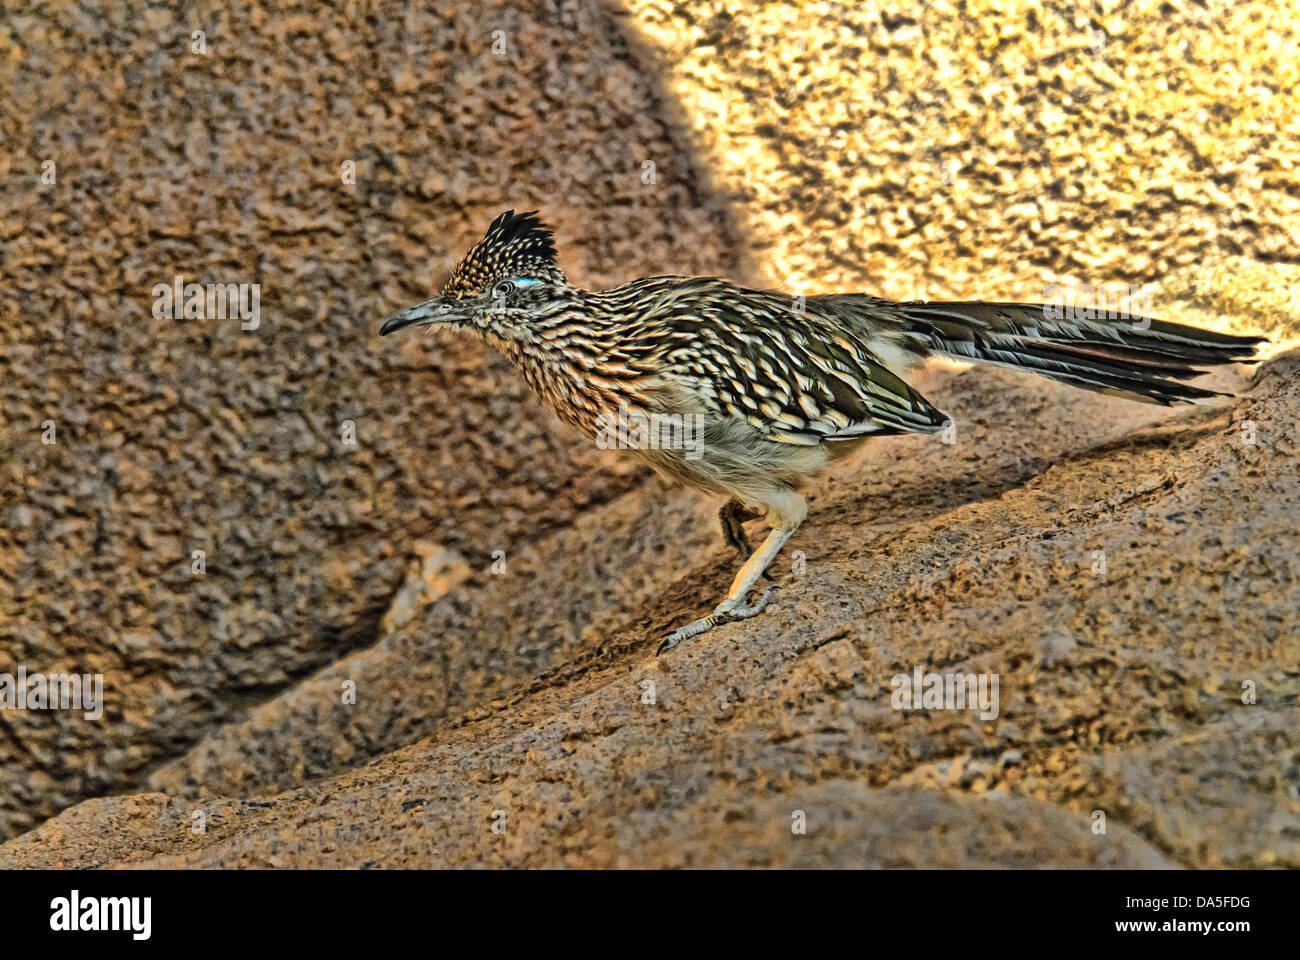 roadrunner, geococcyx califiornianus, bird, USA, United States, America, - Stock Image